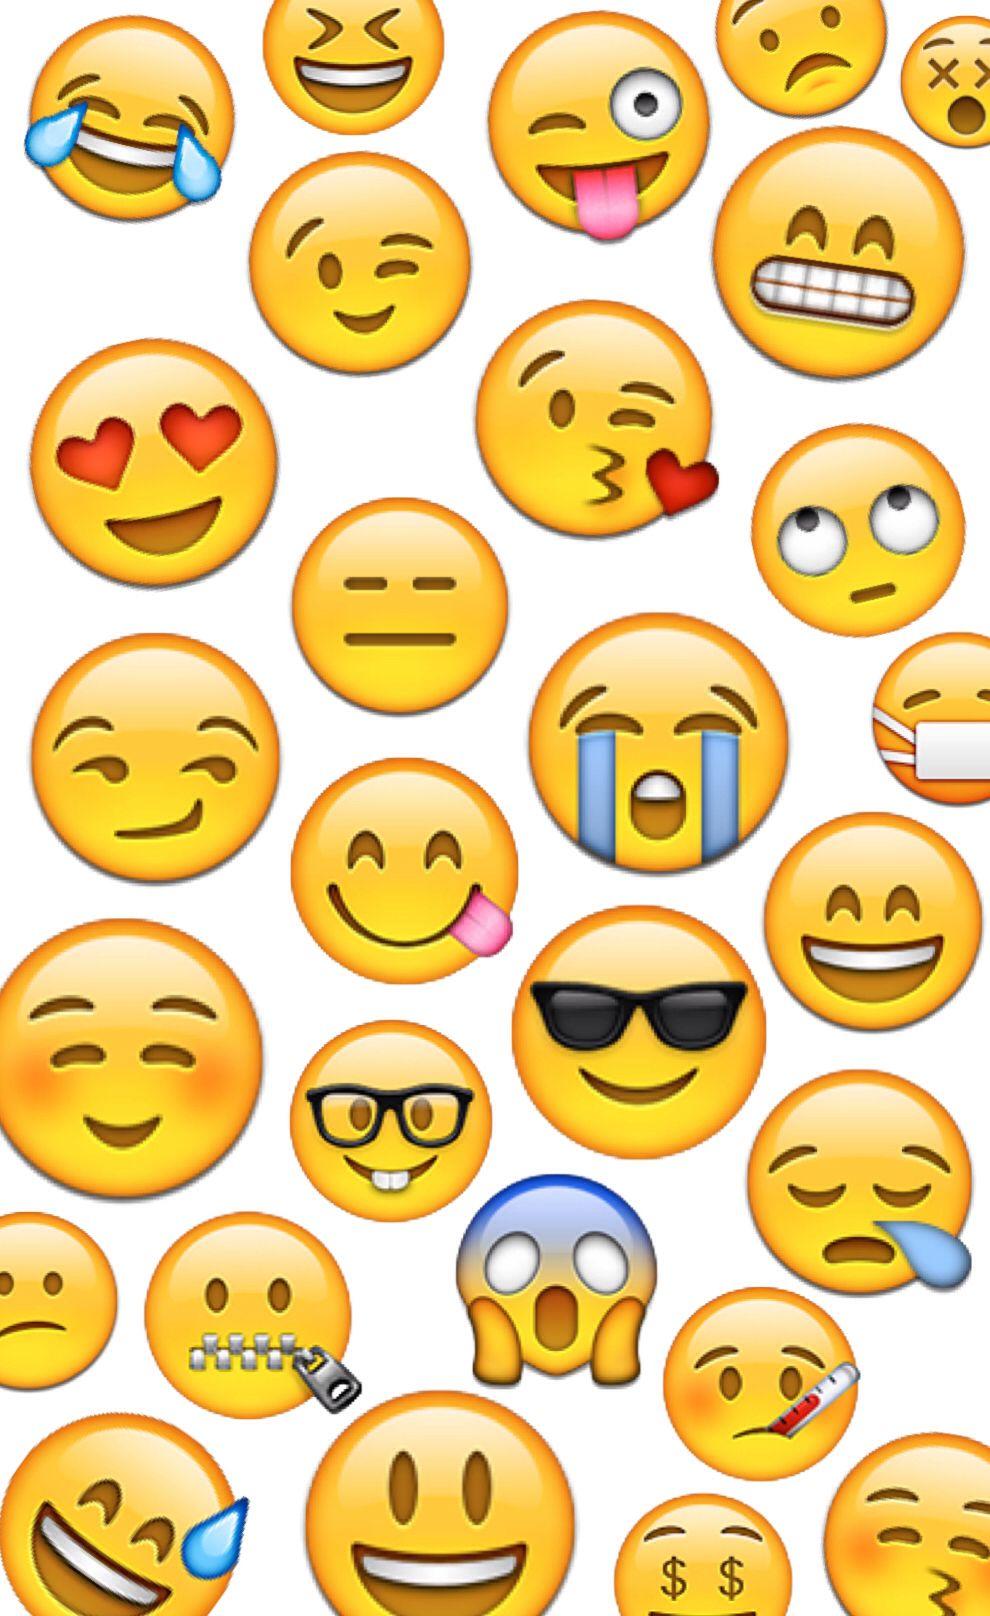 Emoji Wallpaper Emoji Wallpaper Wallpaper Ideas Text Me Papo Emojis Iphone